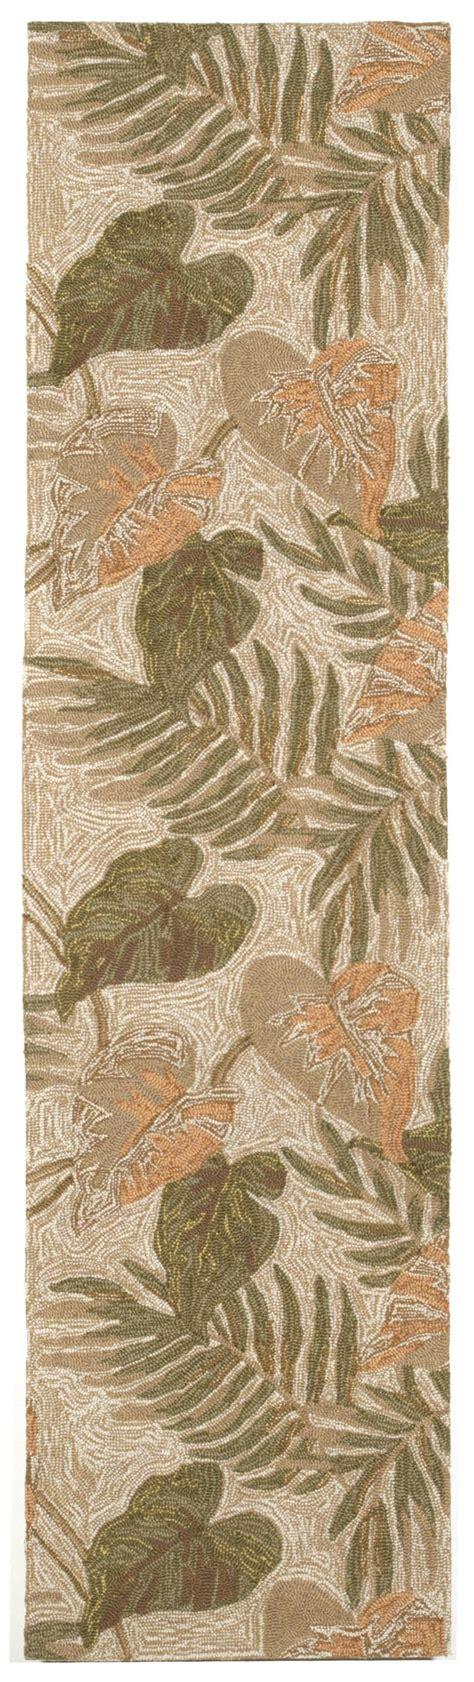 trans ocean rvl ravella neutral tropical leaf area rug trans ocean ravella tropical leaf neutral 2066 12 area rug